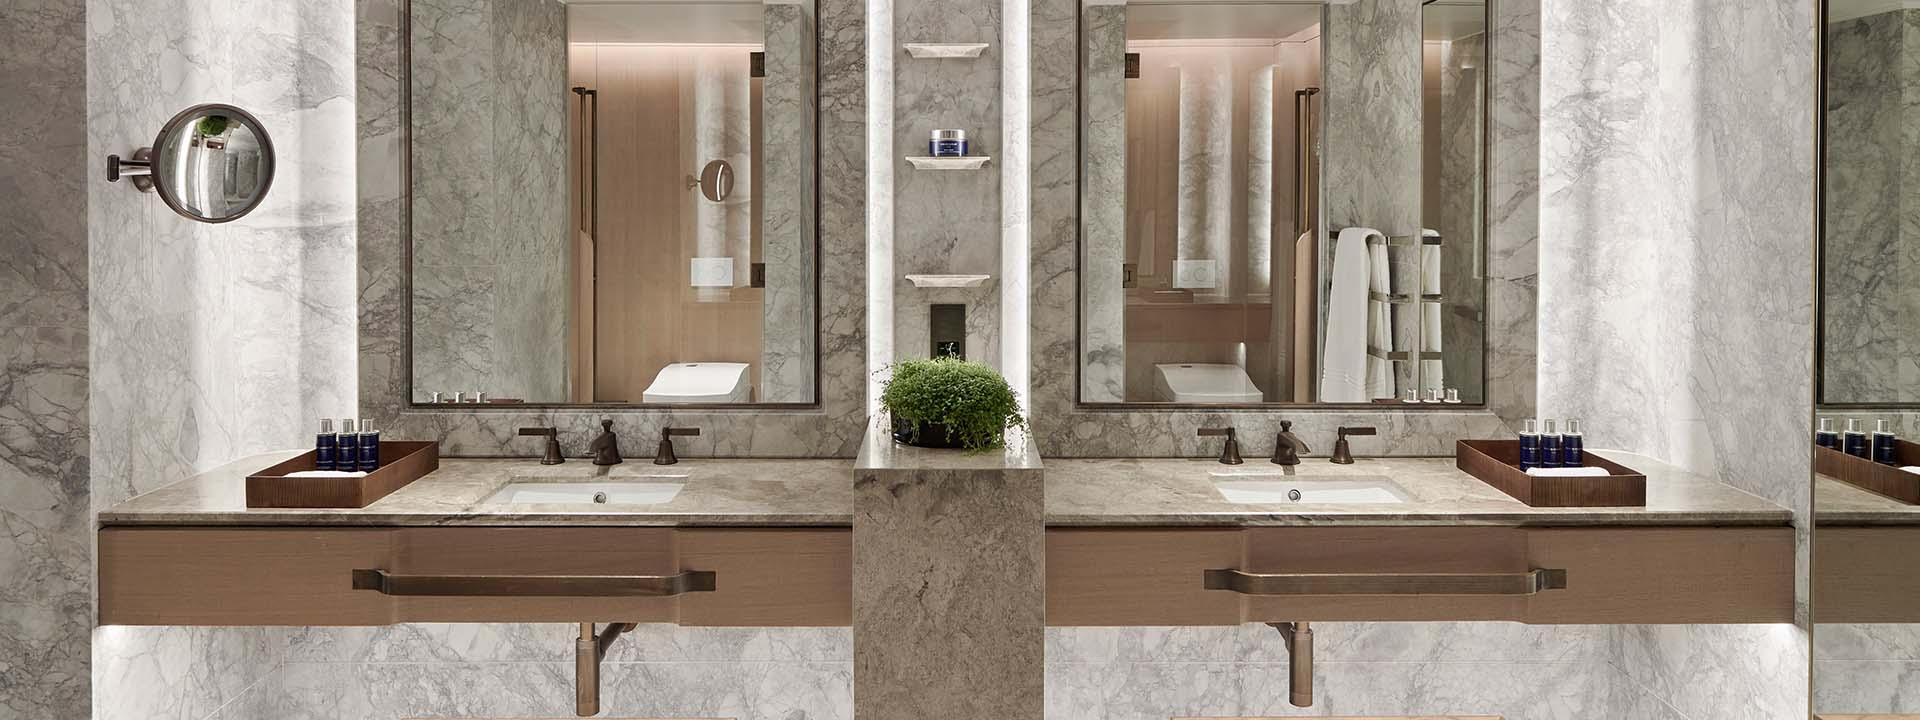 Grand Pavilion Penthouse Bathroom